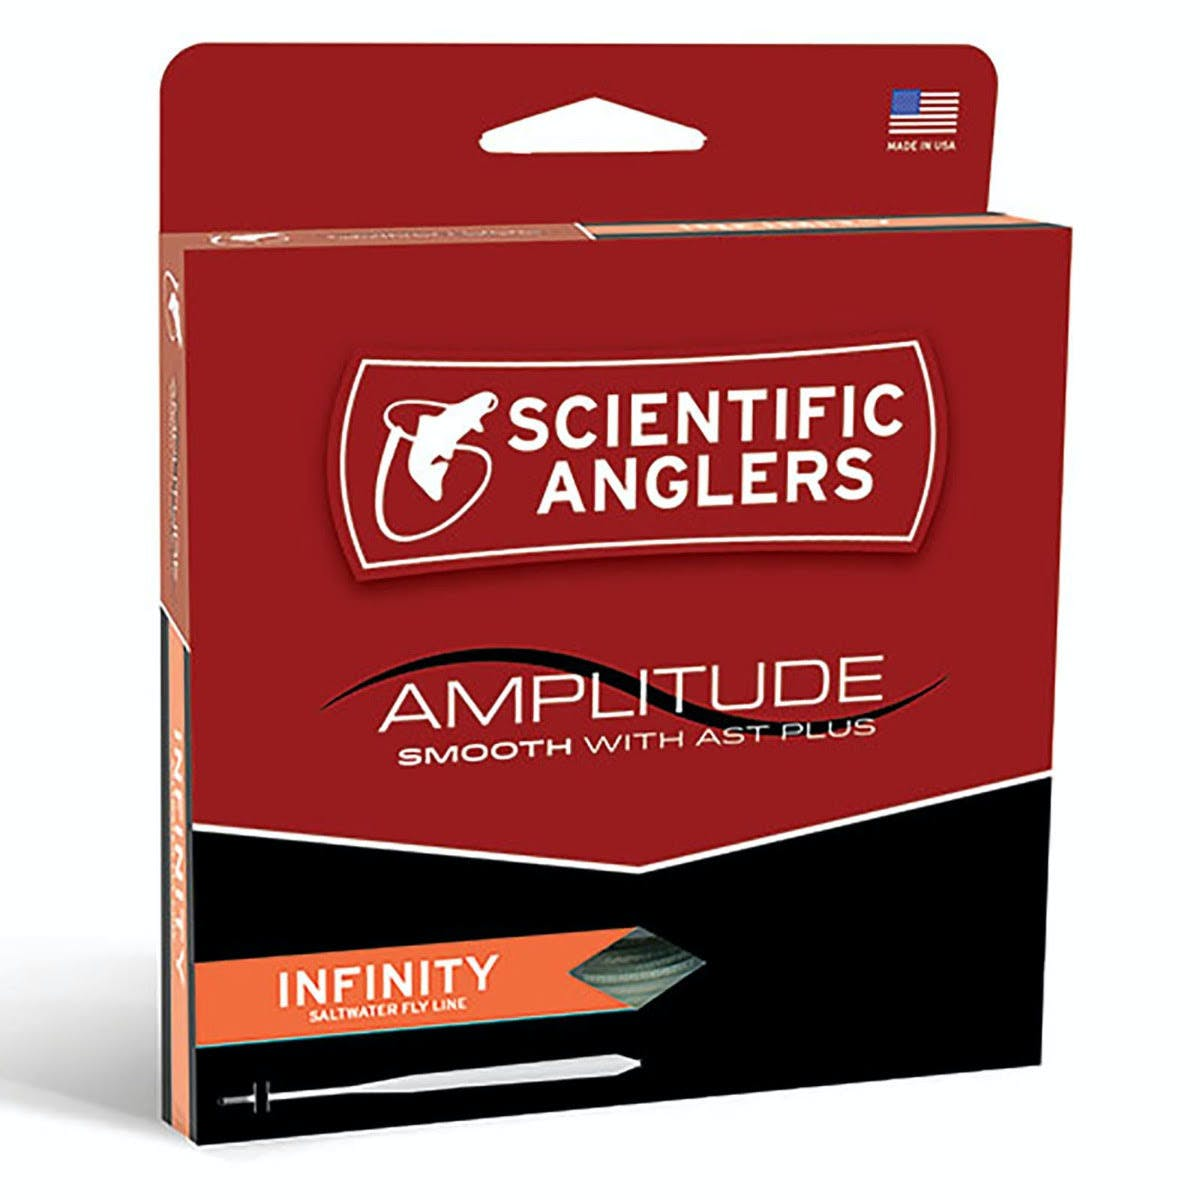 Scientific Anglers Amplitude Smooth Infinity Salt Fly Line - WF11F